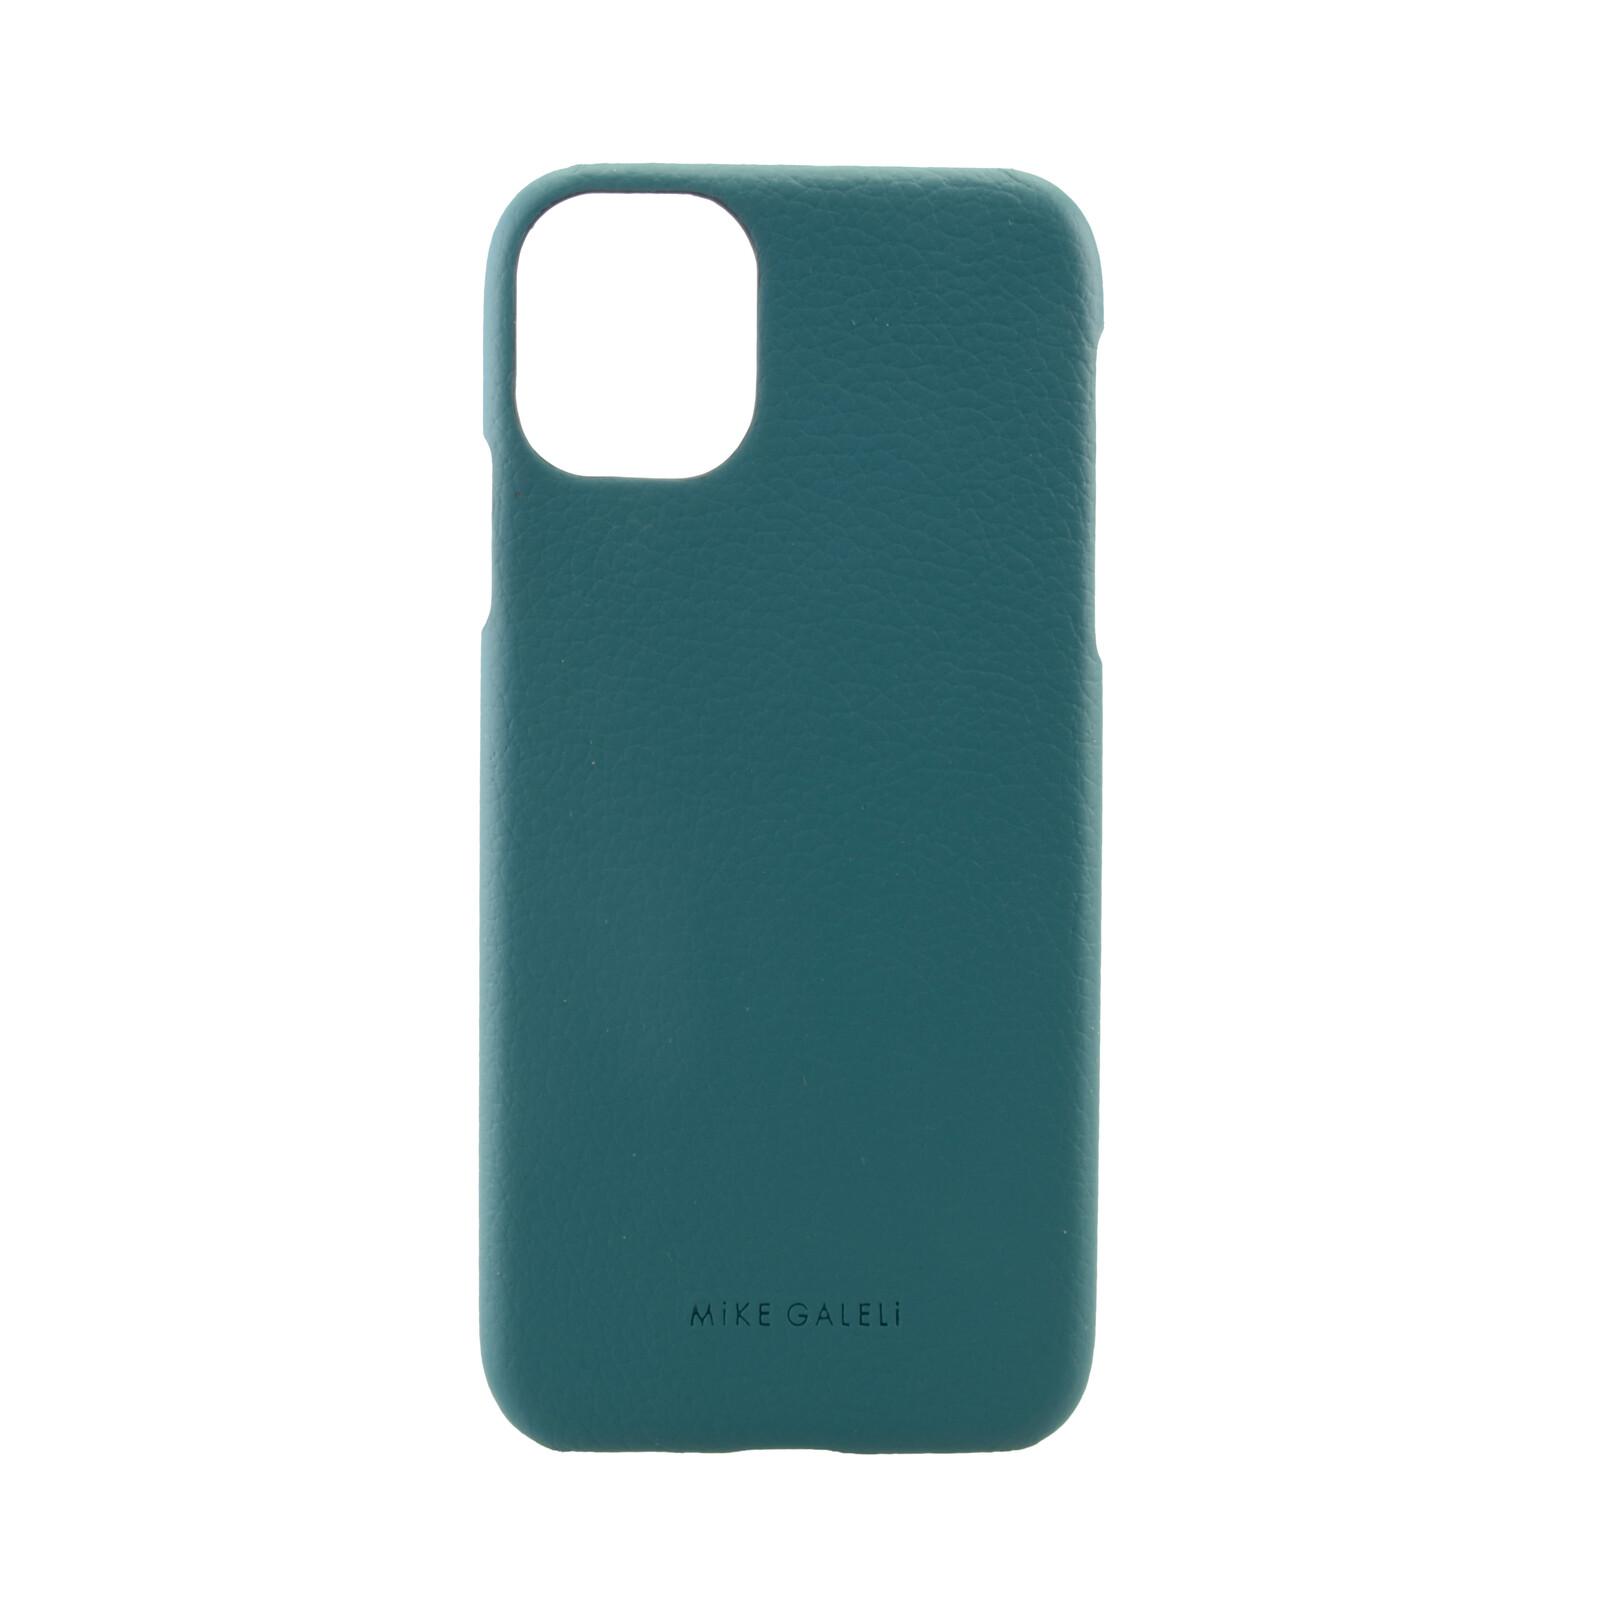 Galeli Back Case LENNY lite Apple iPhone XI R Petrol